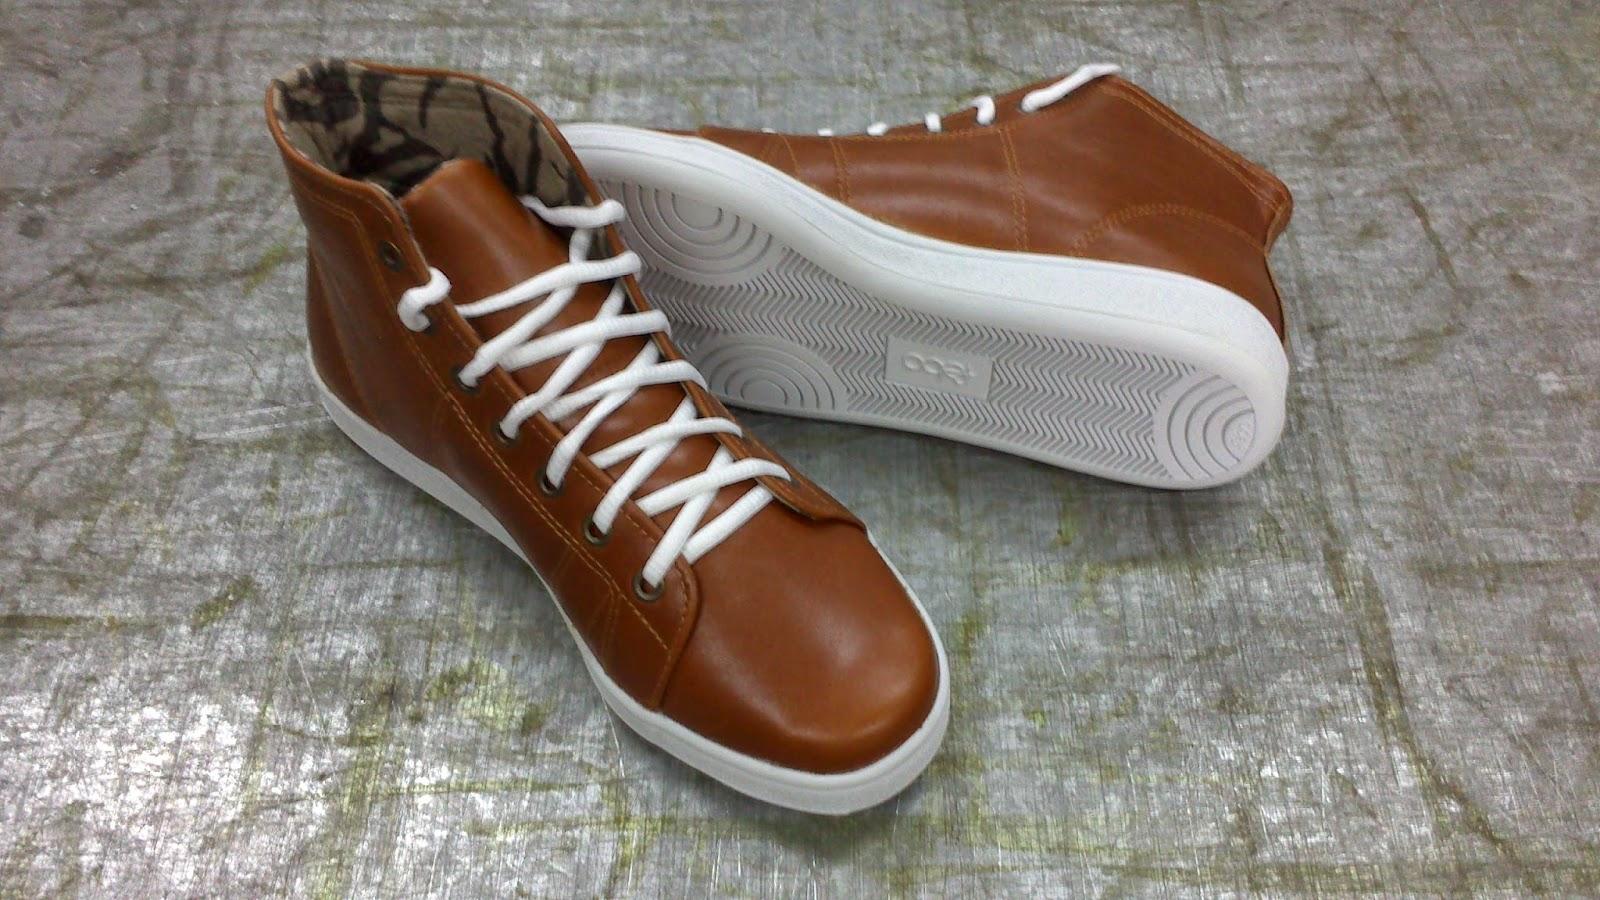 Zapatillas Botitas La moda para hombres Calzados